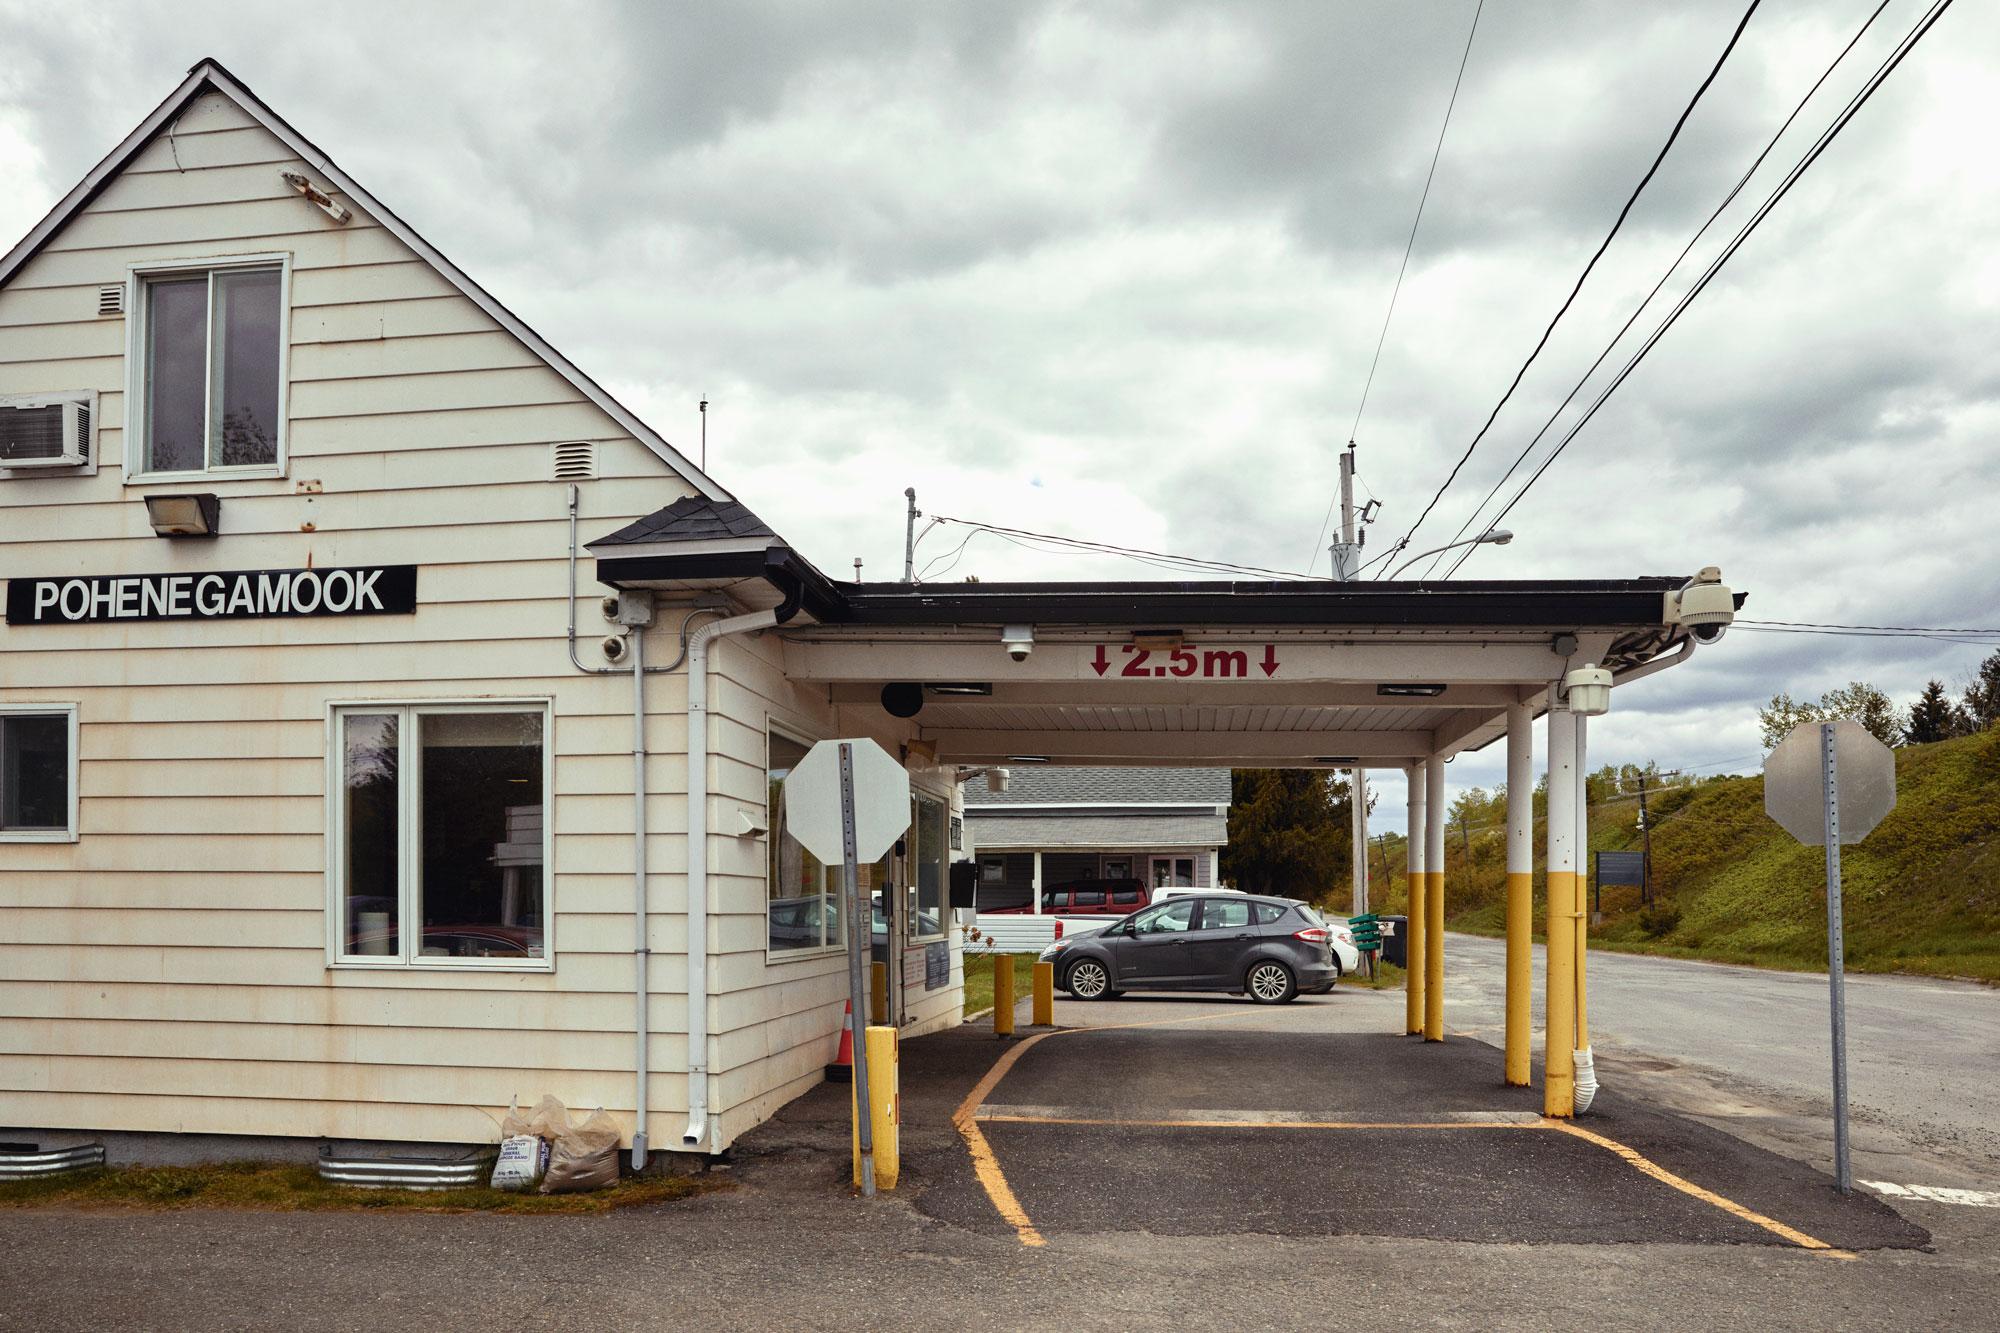 Canadian border station